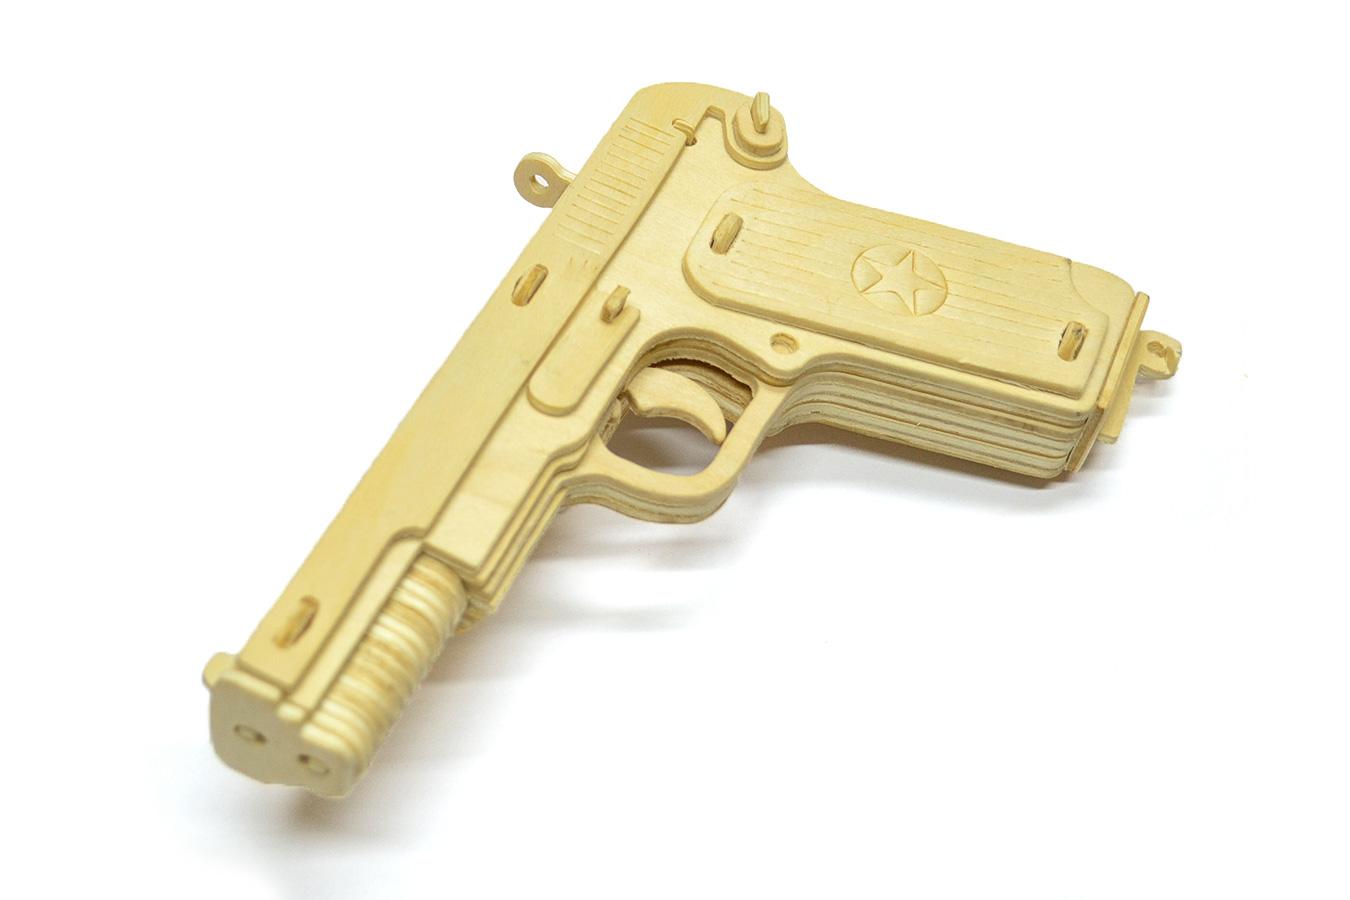 Пистолет Токарева ТТ изображение 2